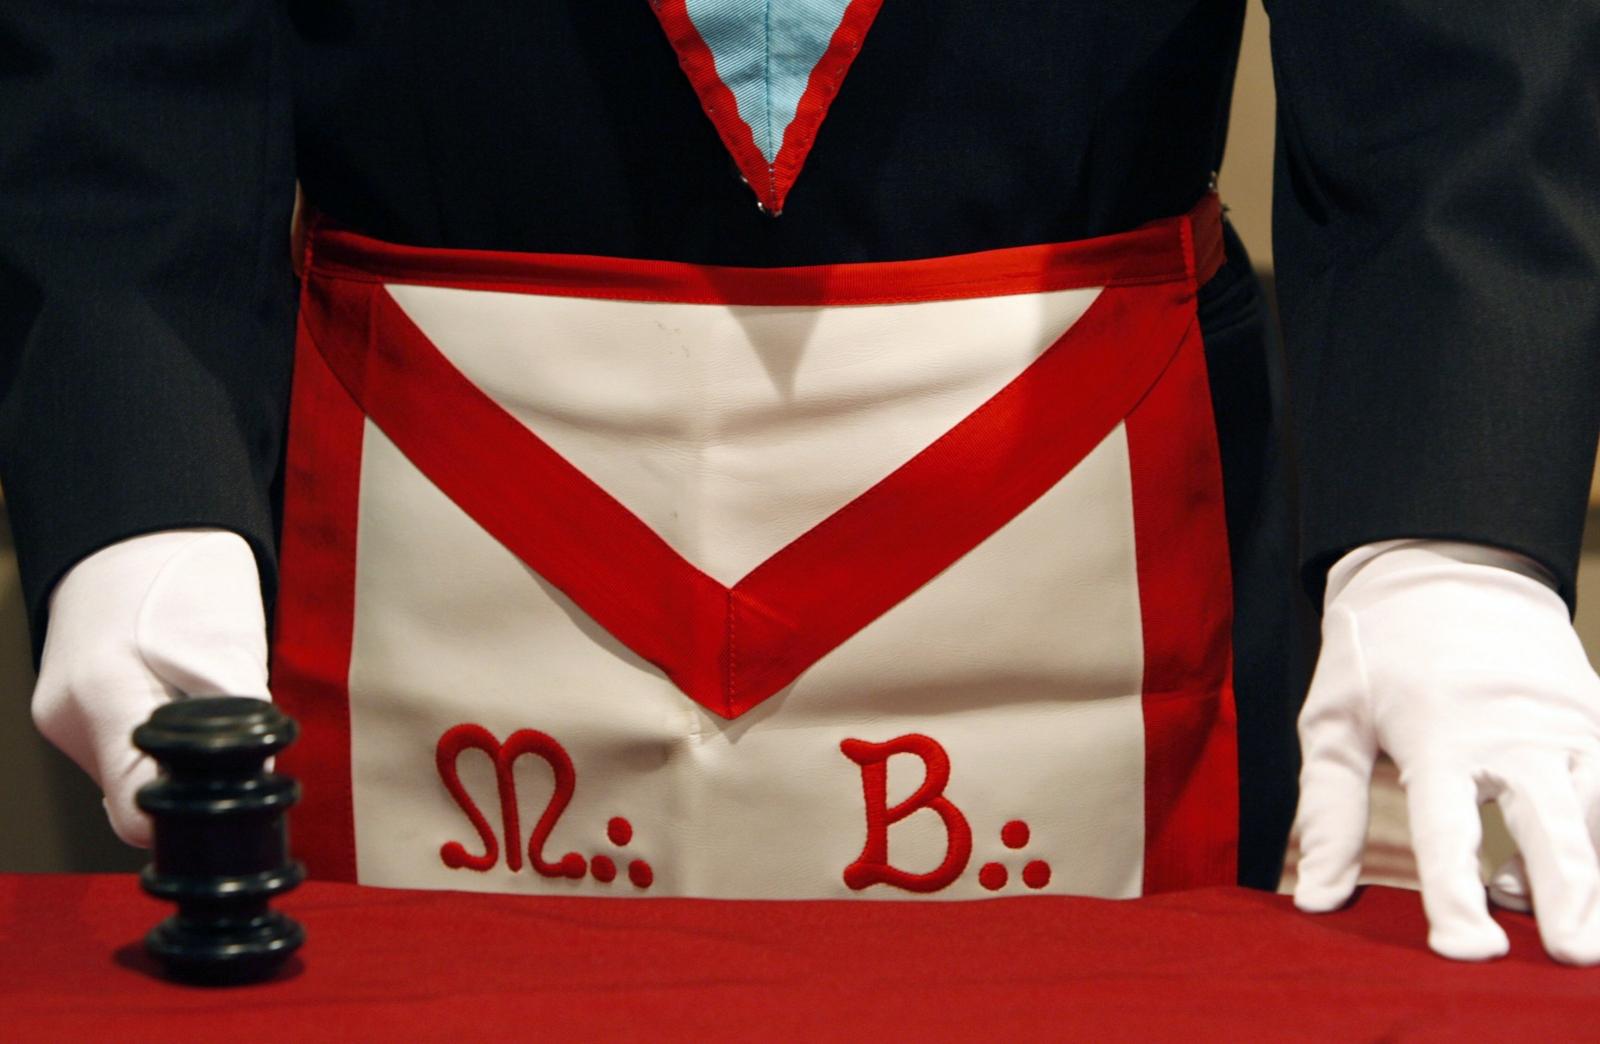 Freemasons make air ambulance gift